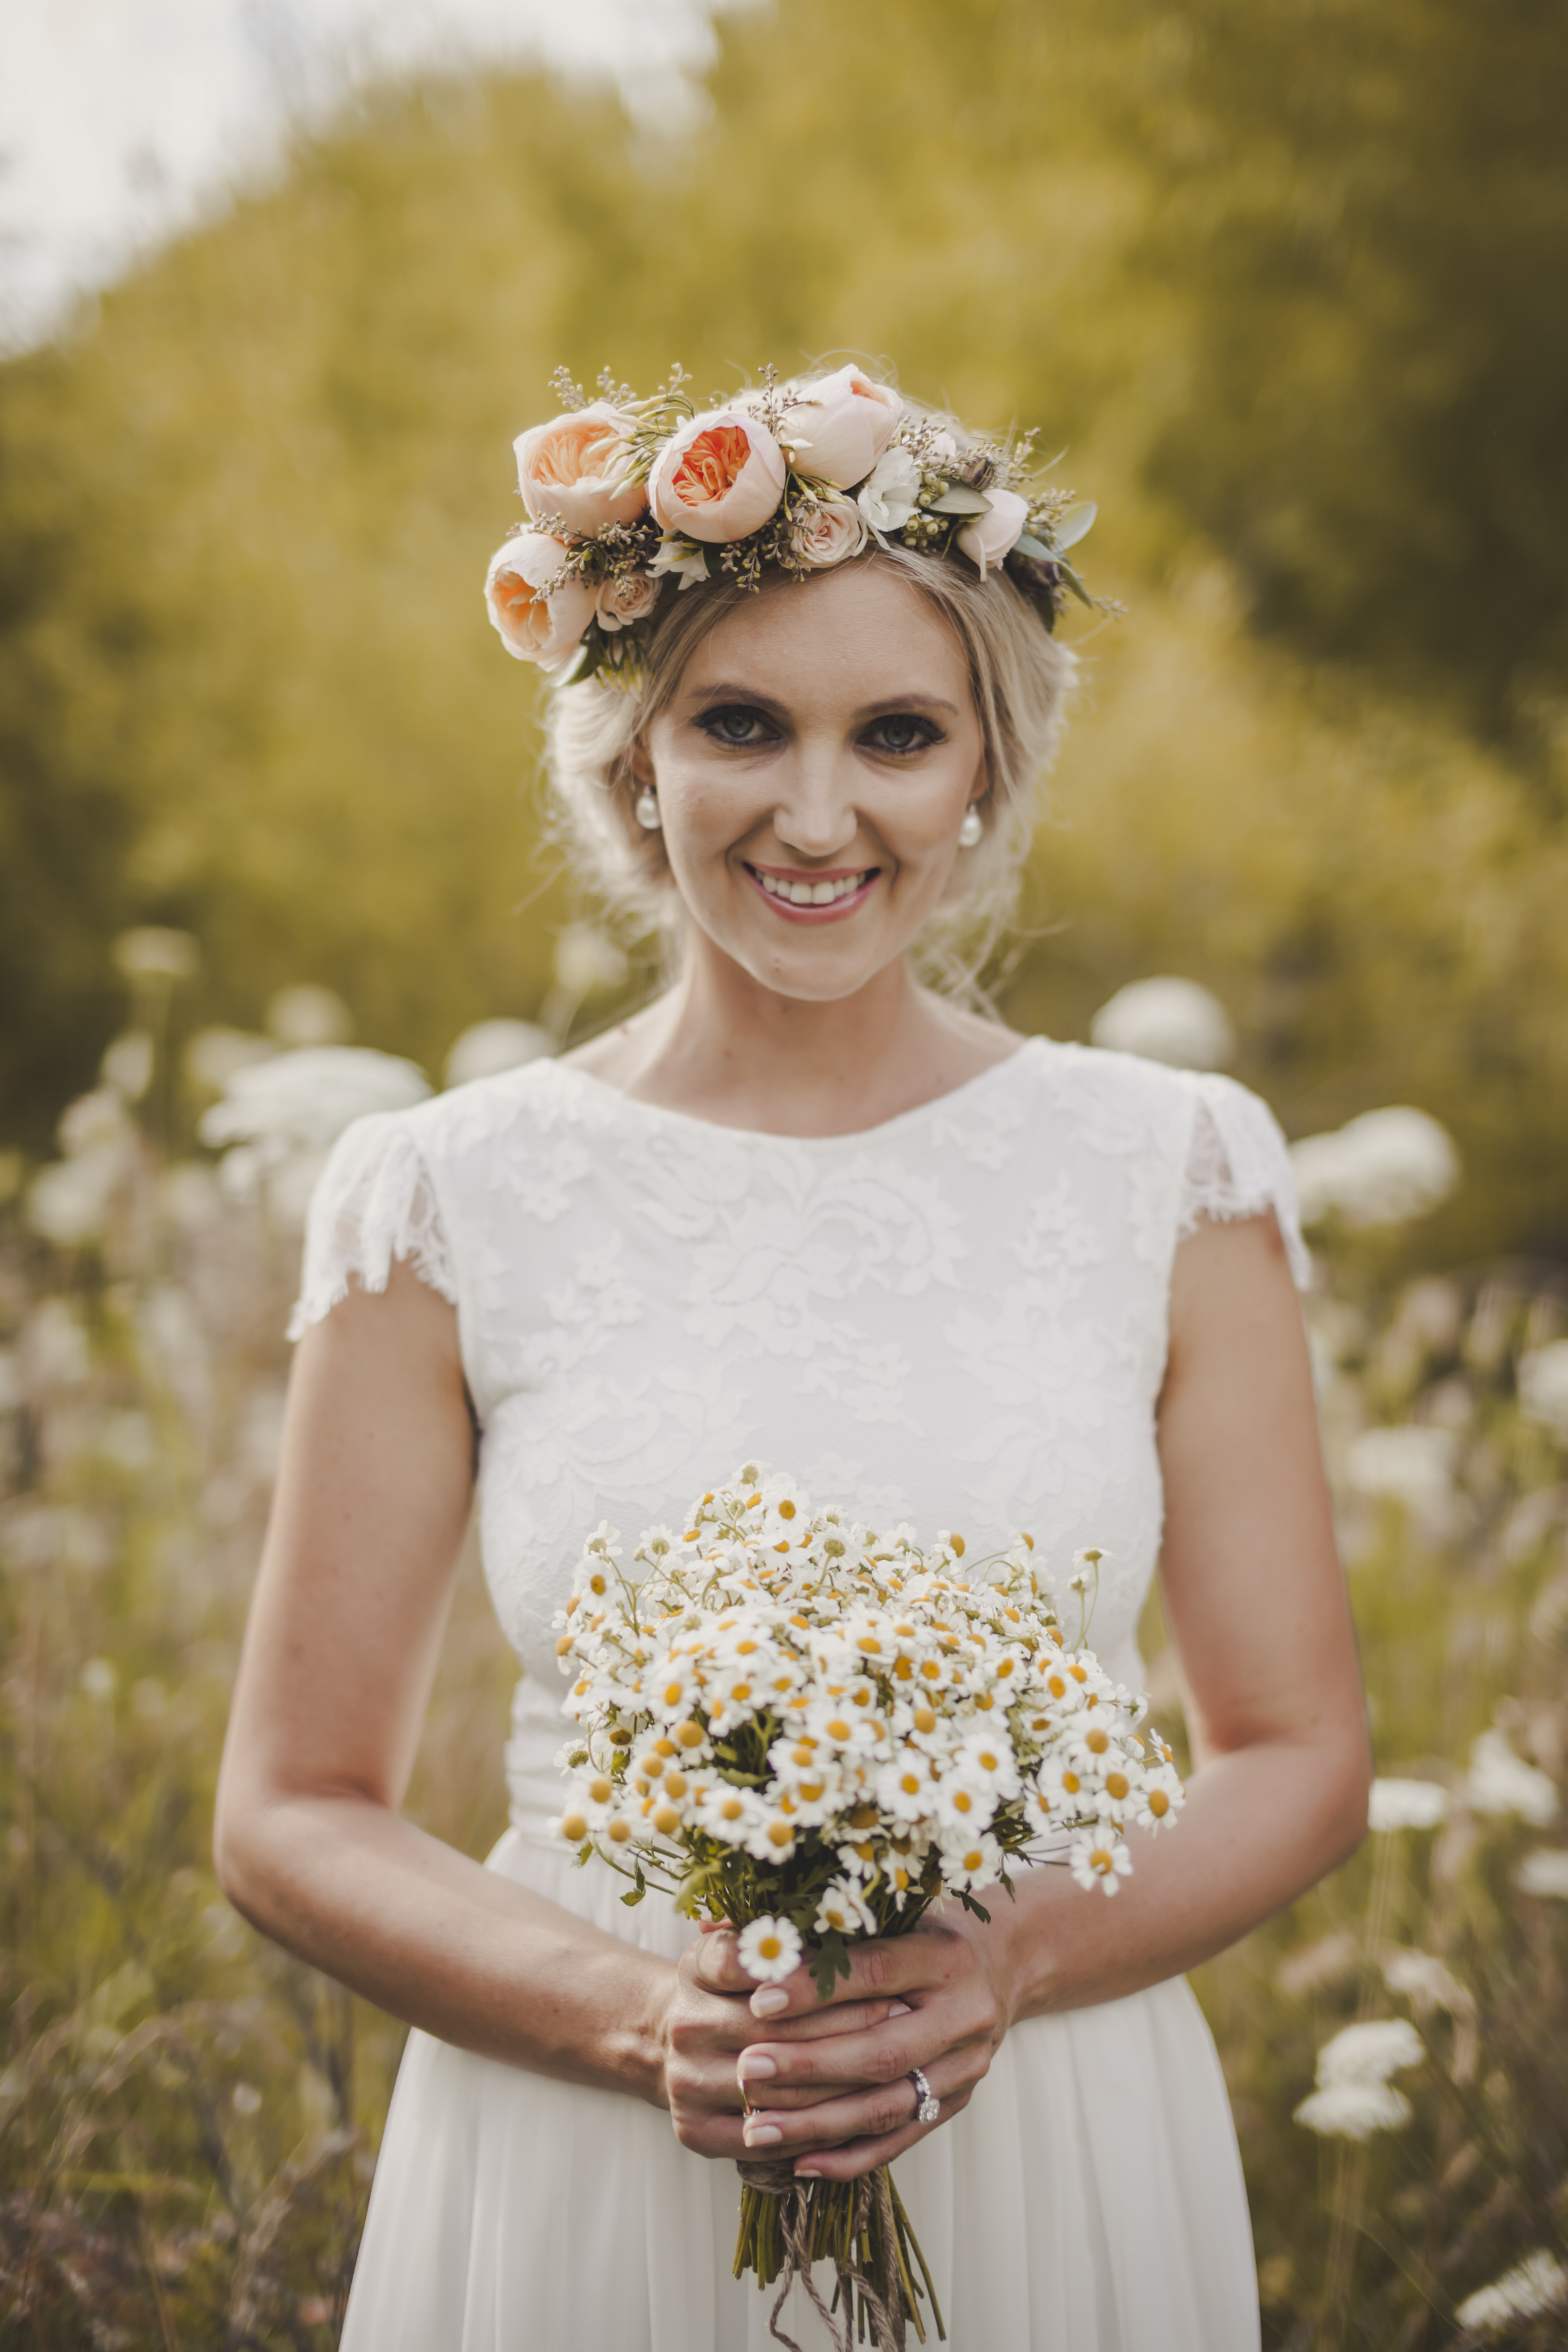 Flower Crown- Photo by Heather Liddell-1-4 (2017_09_03 06_58_33 UTC).jpg